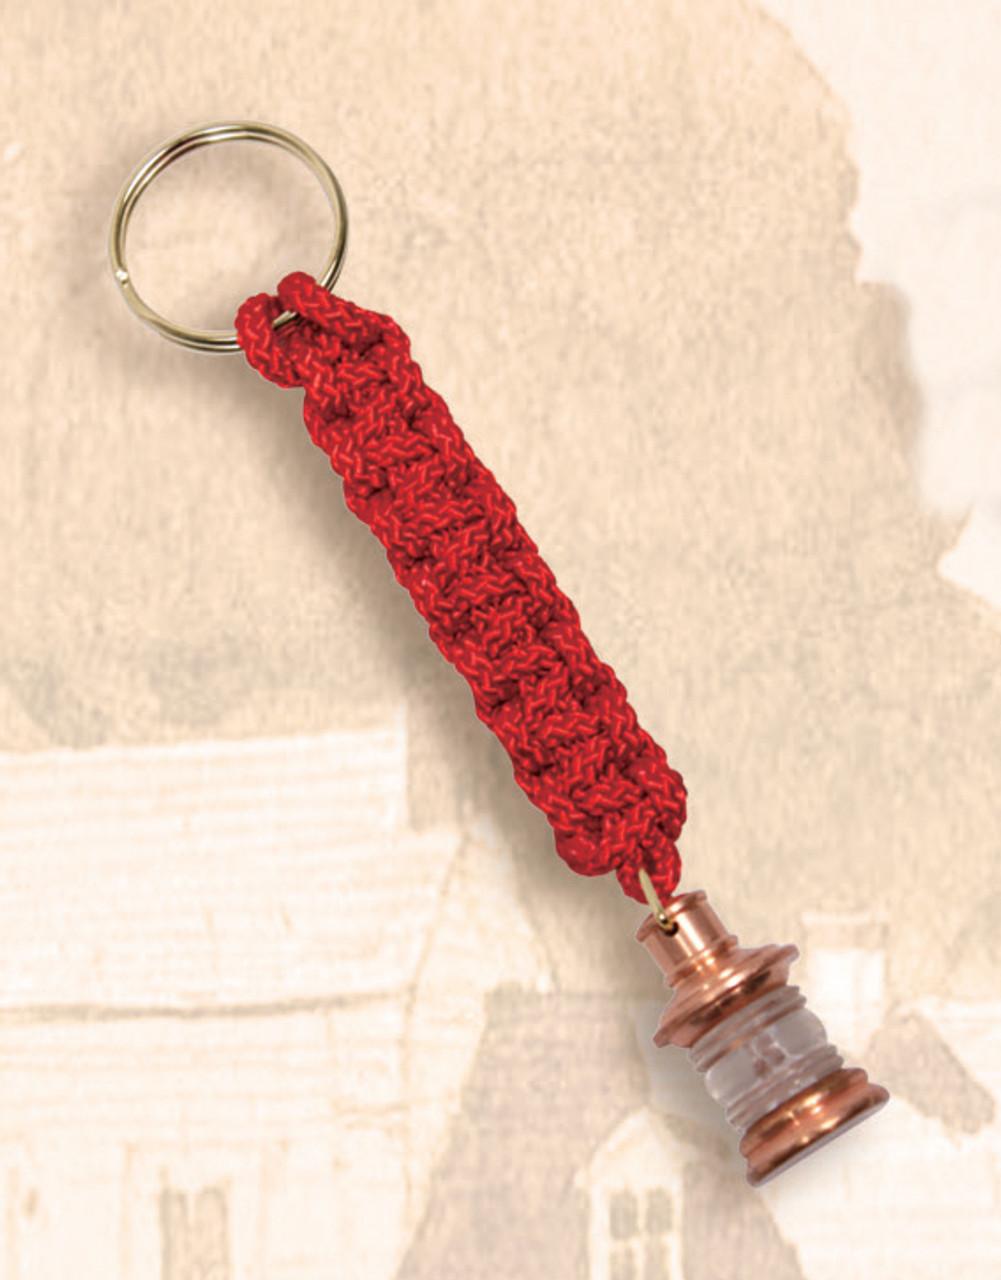 Brass Key Chain - Lantern with Red Lanyard